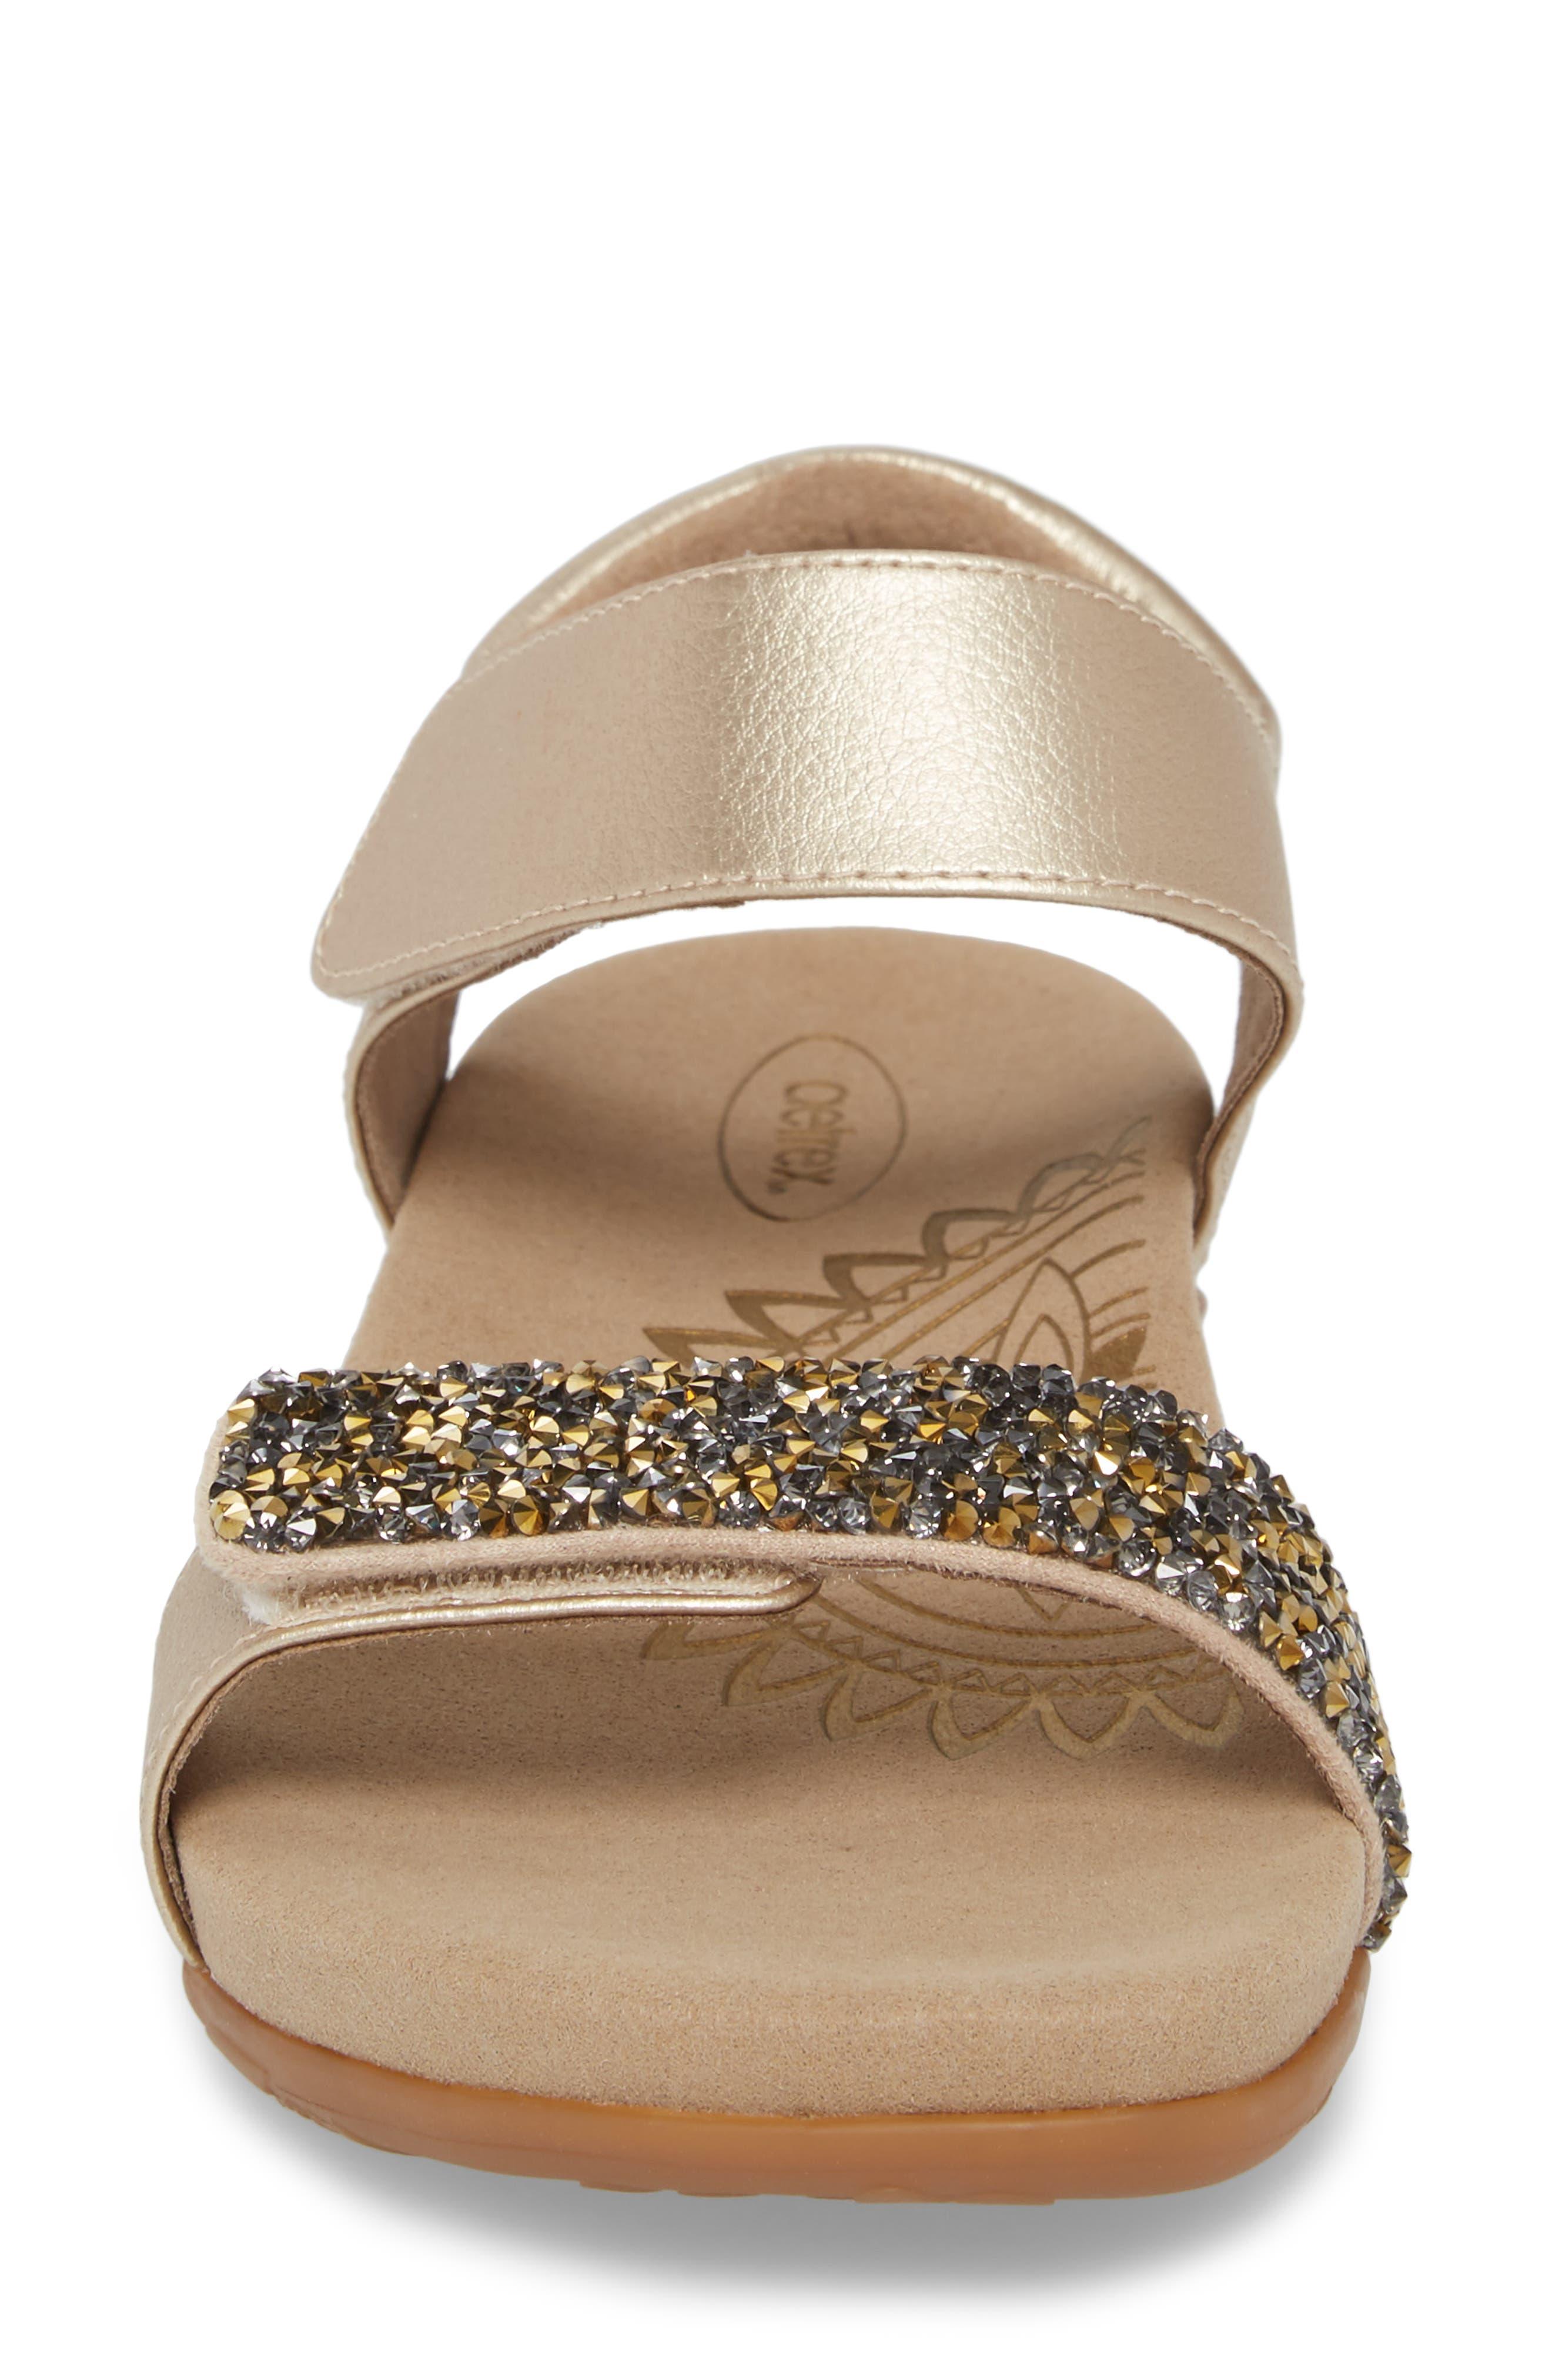 Maria Embellished Sandal,                             Alternate thumbnail 4, color,                             Gold Leather